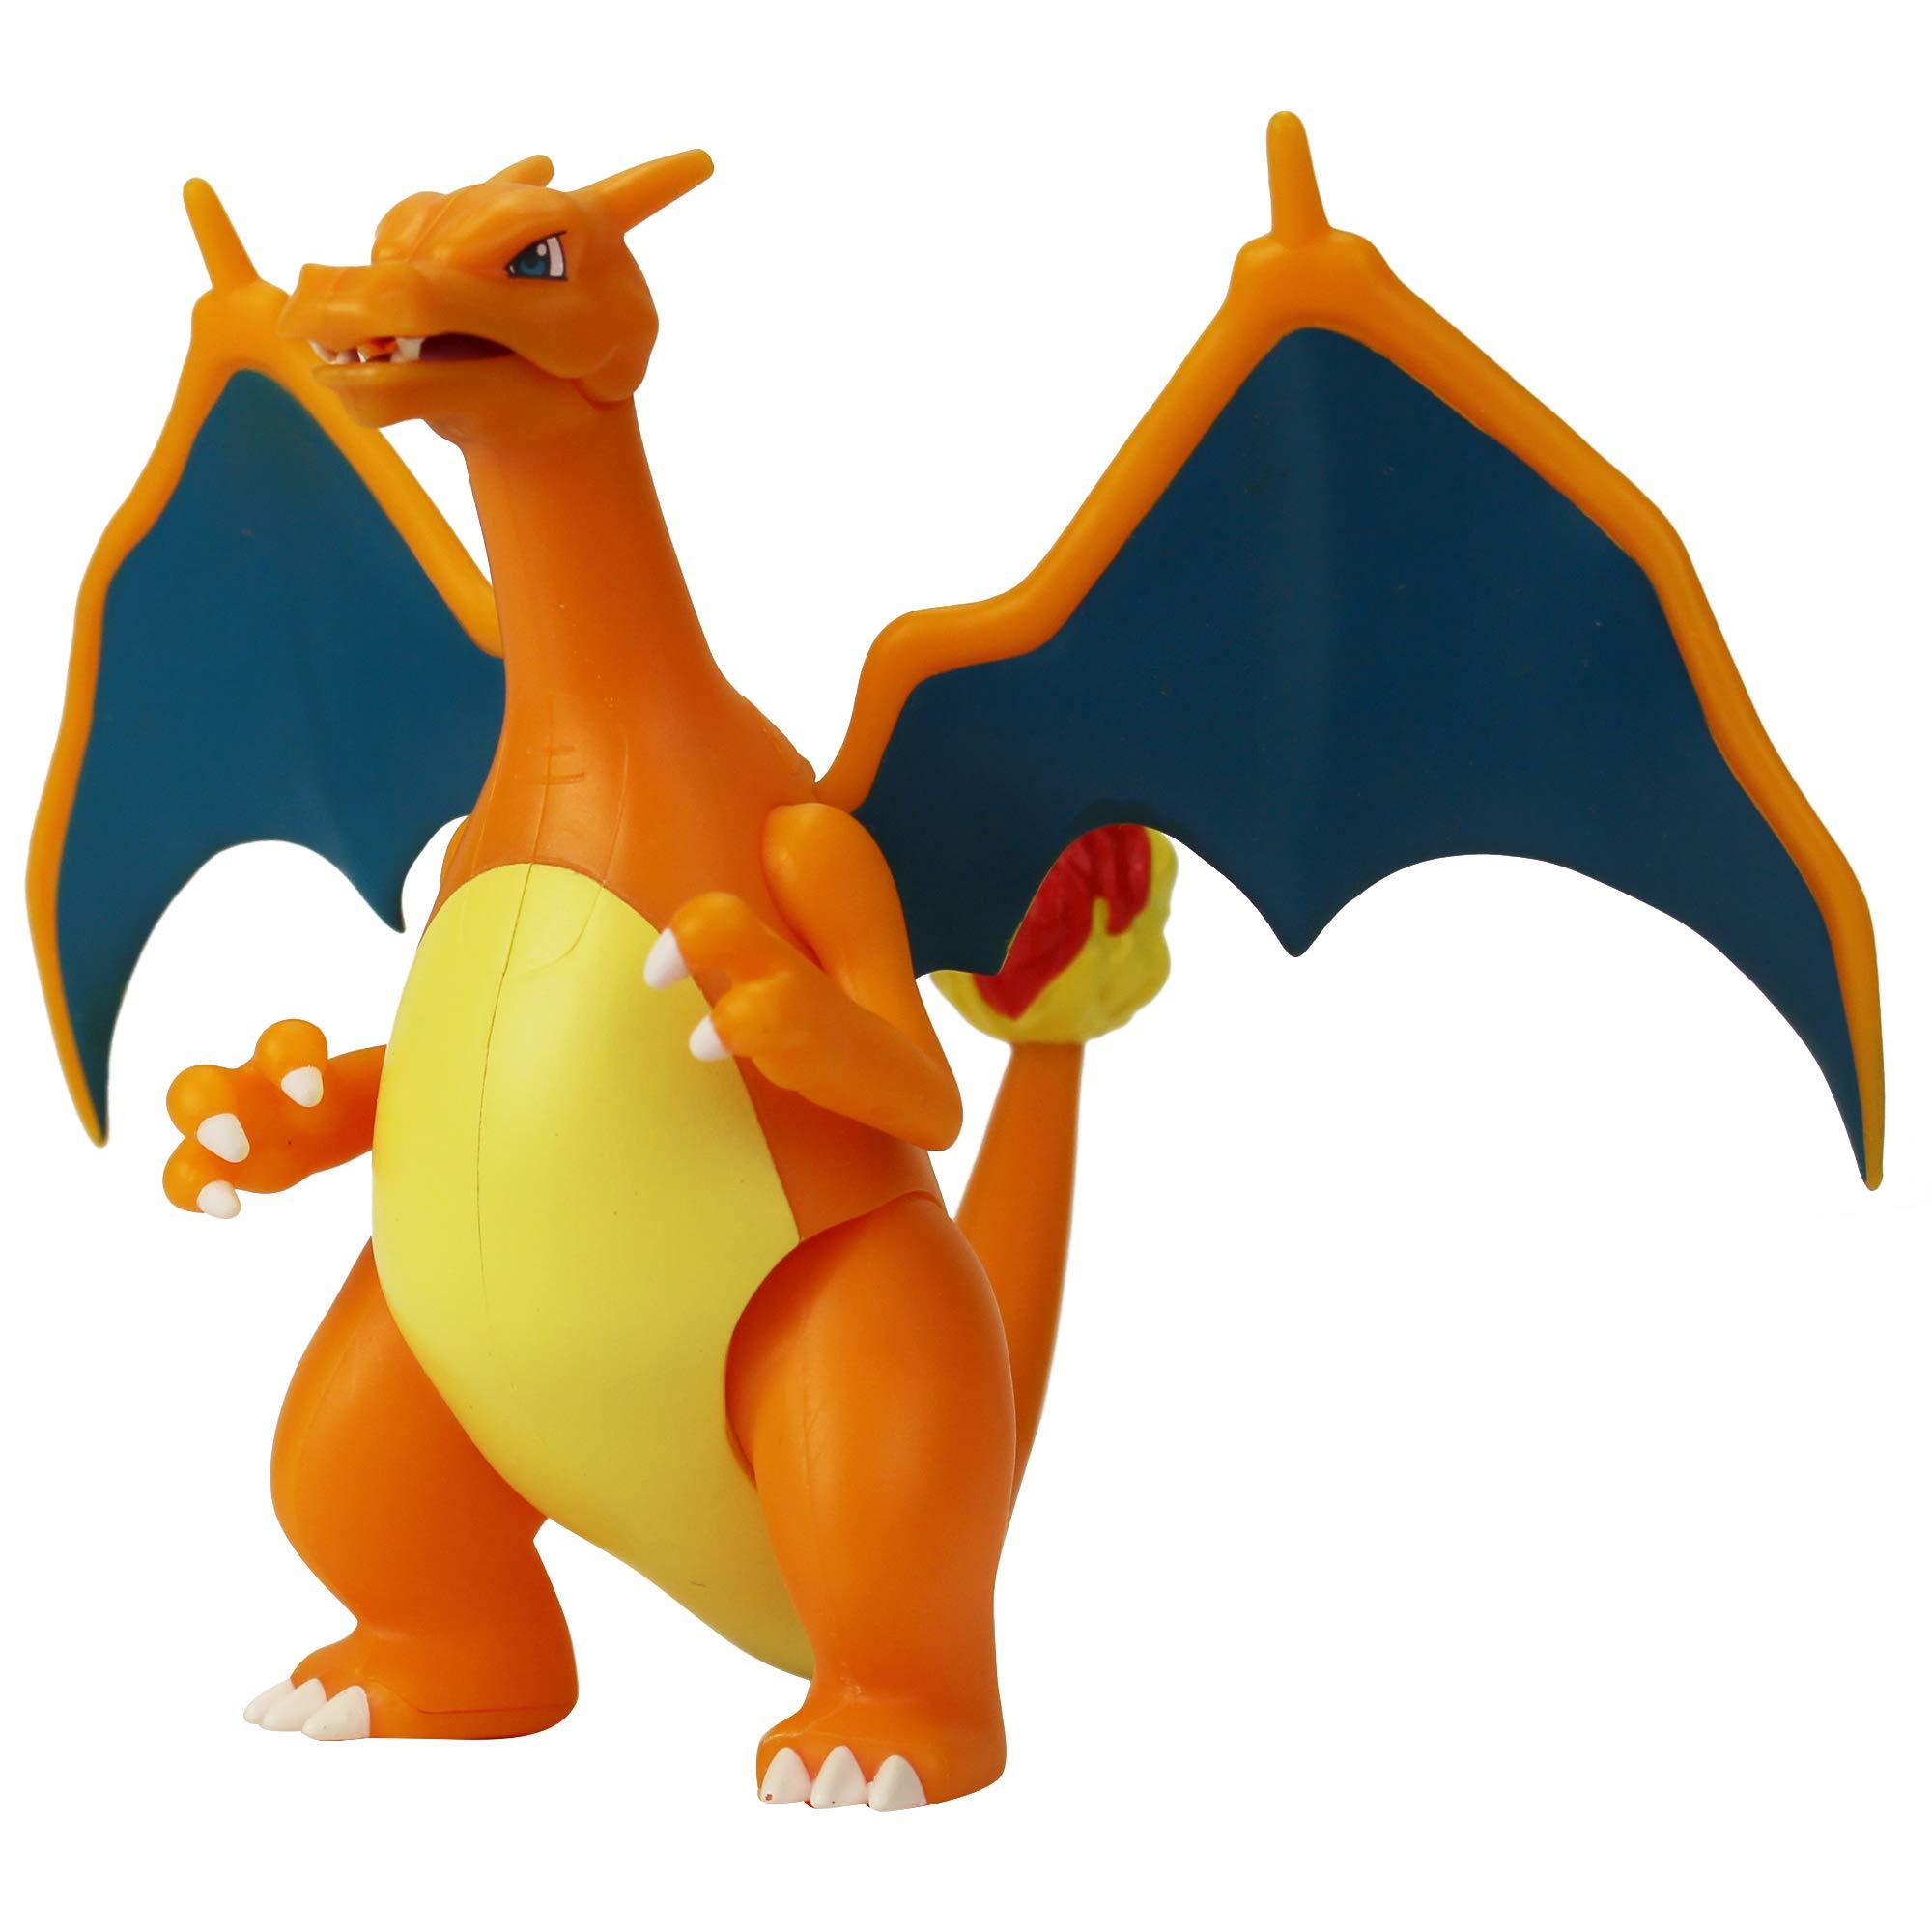 PoKéMoN 95132 Pokemon 4.5 Inch Battle Feature Figure-Charizard